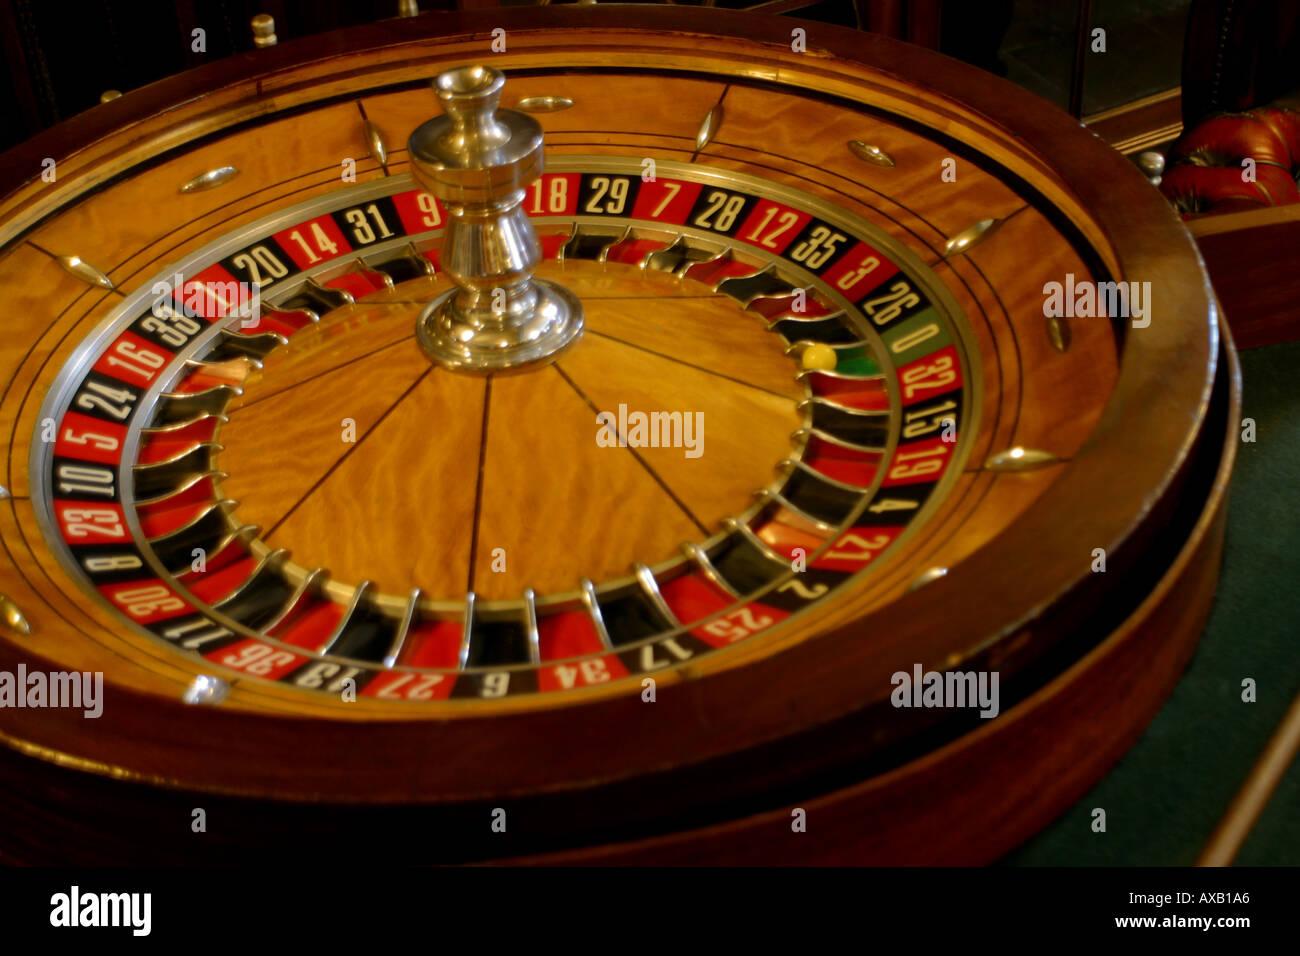 Vintage roulette wheel value merit cyprus poker